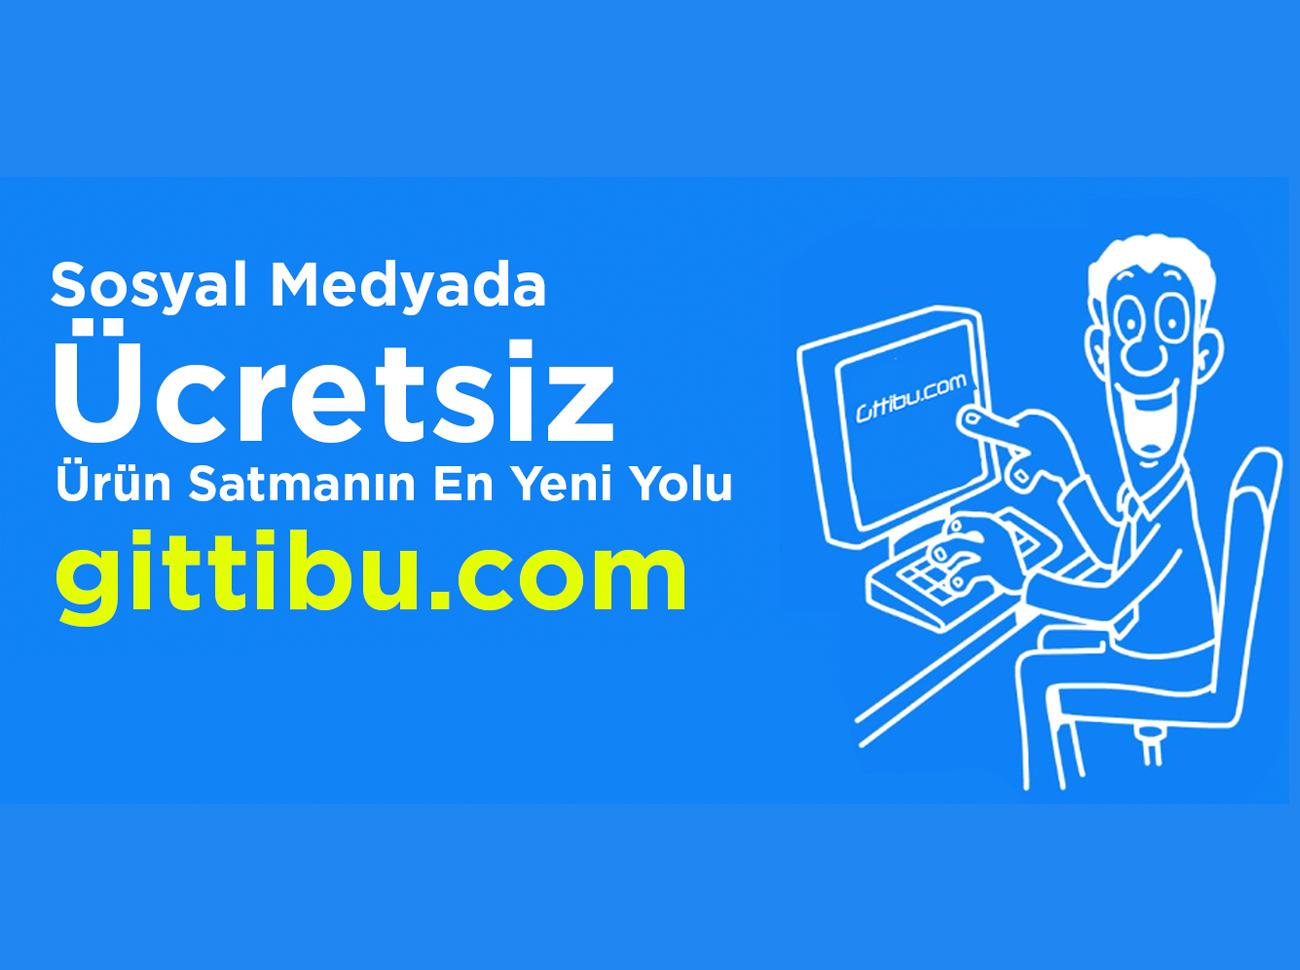 Gittibu.com